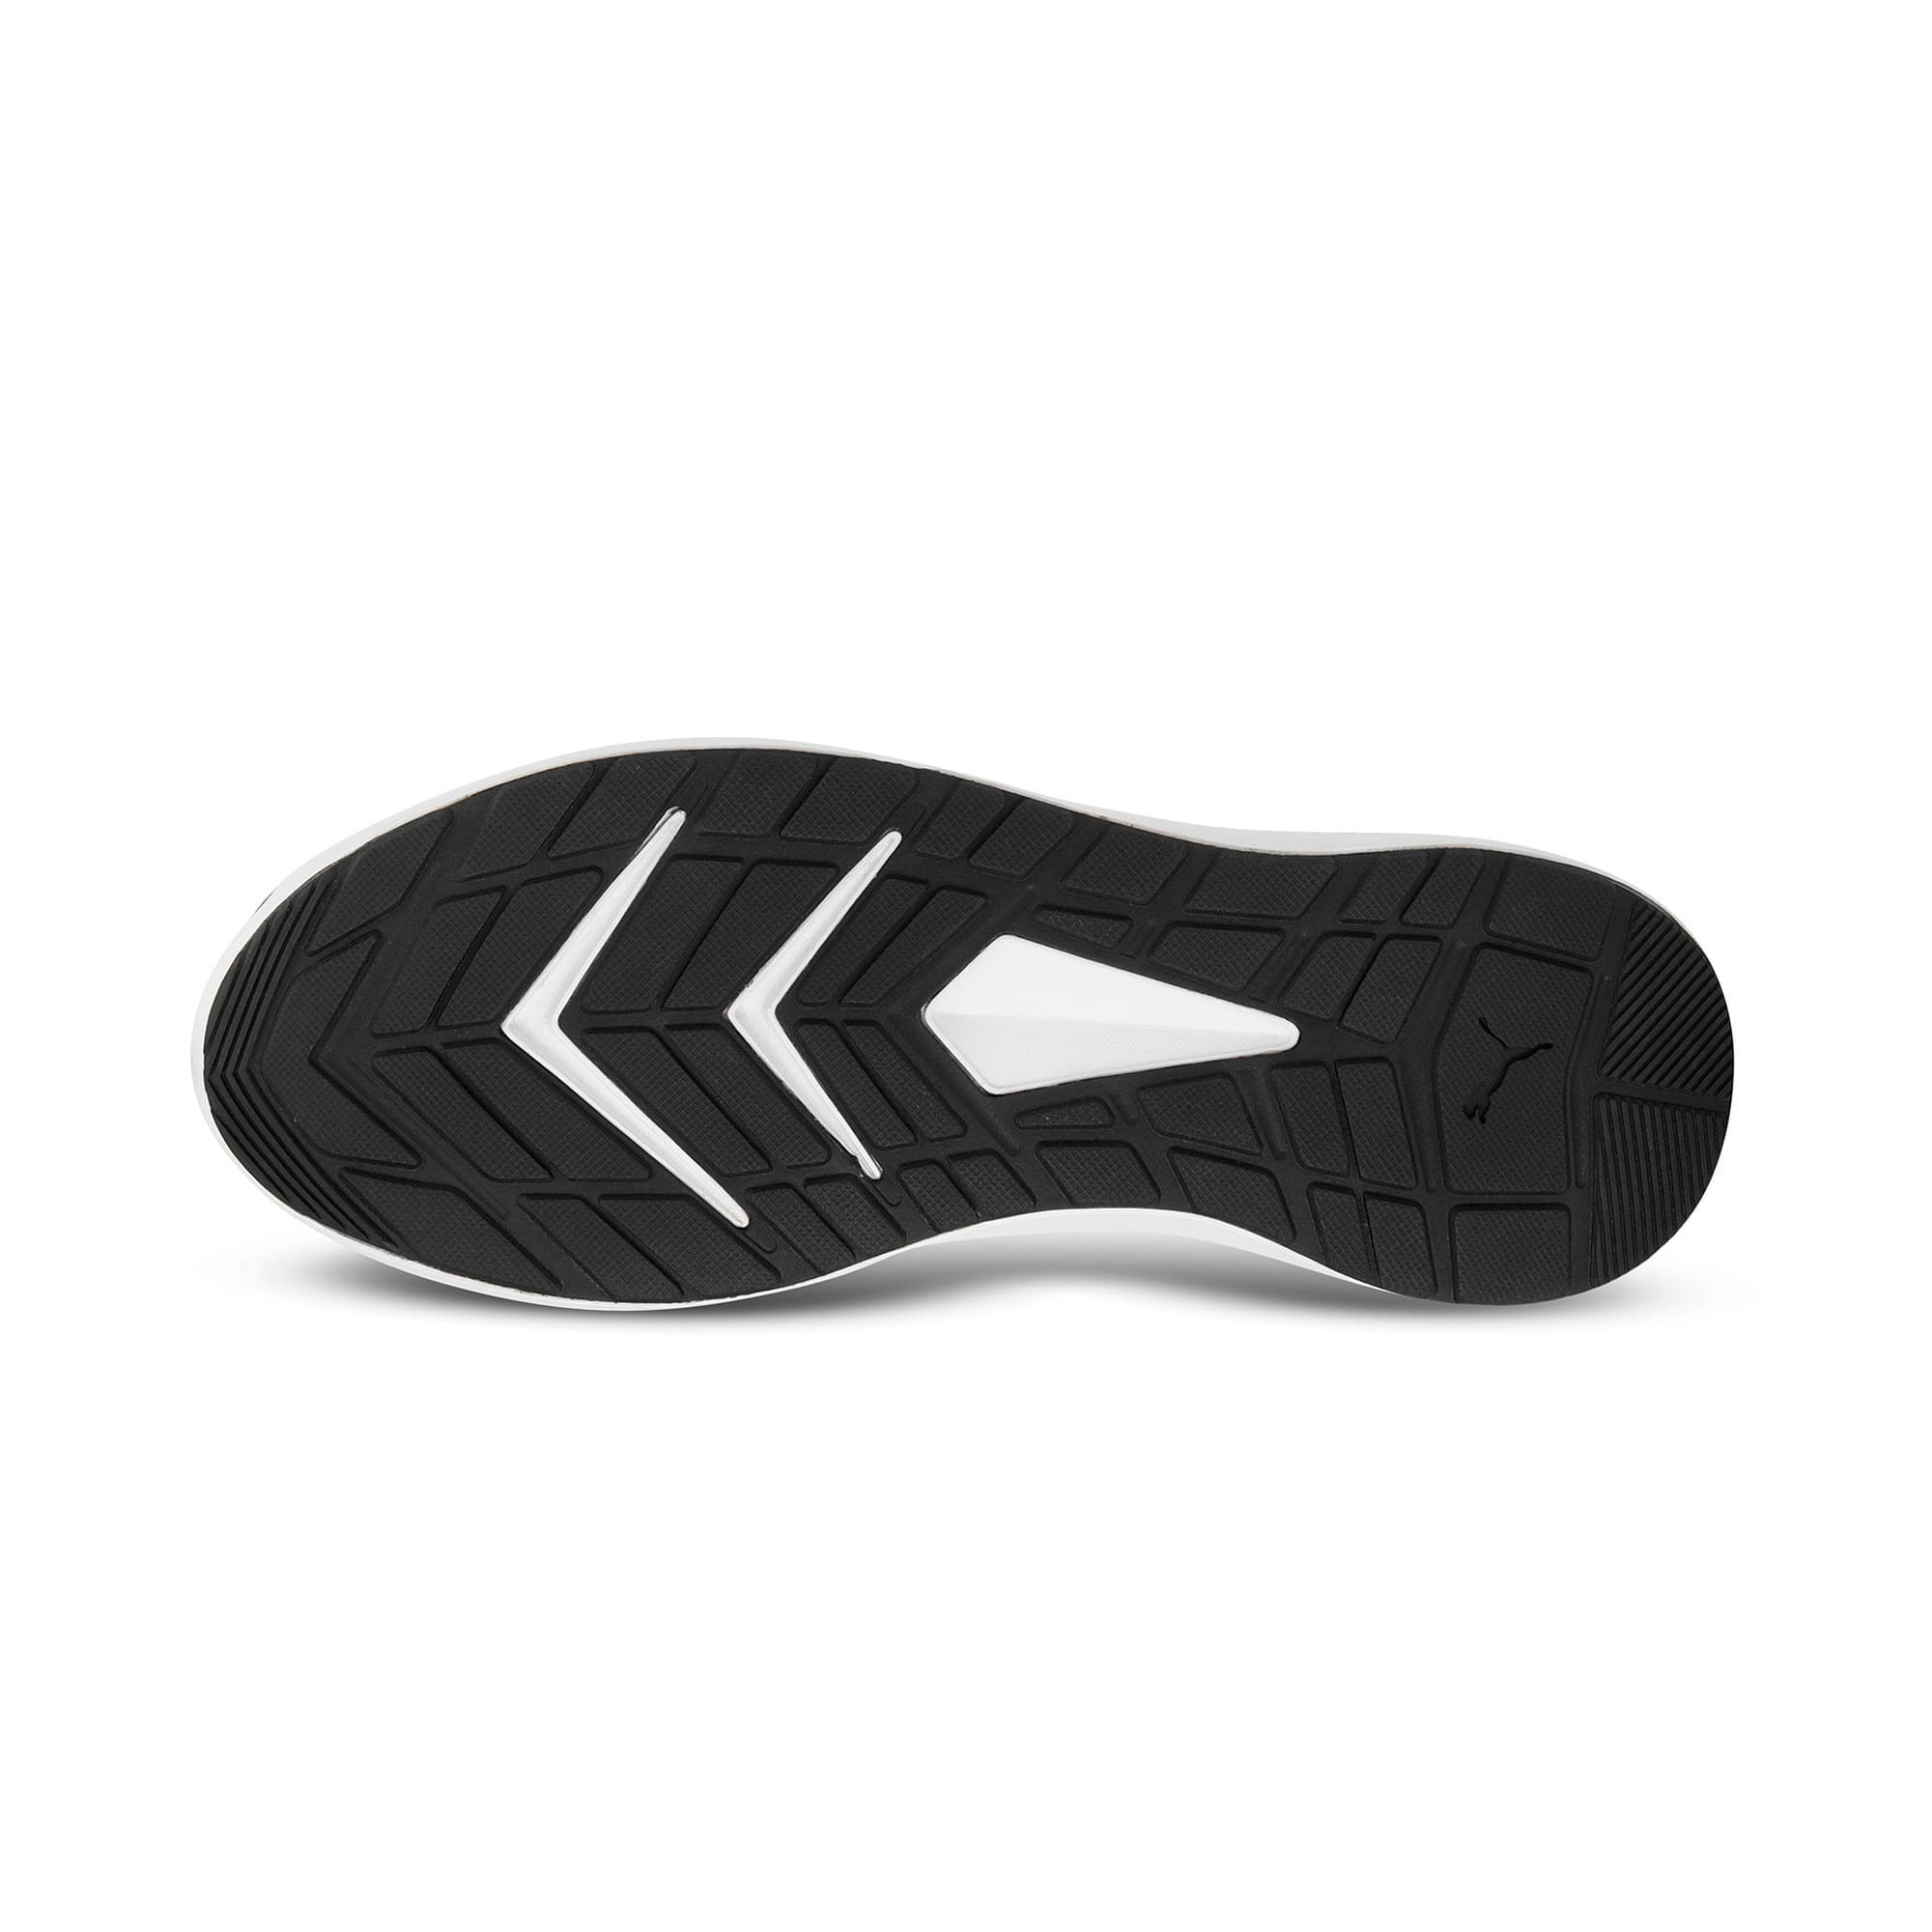 Thumbnail 4 of Propel EL IDP Men's Sportstyle Shoes, Asphalt-Silver-White-Black, medium-IND